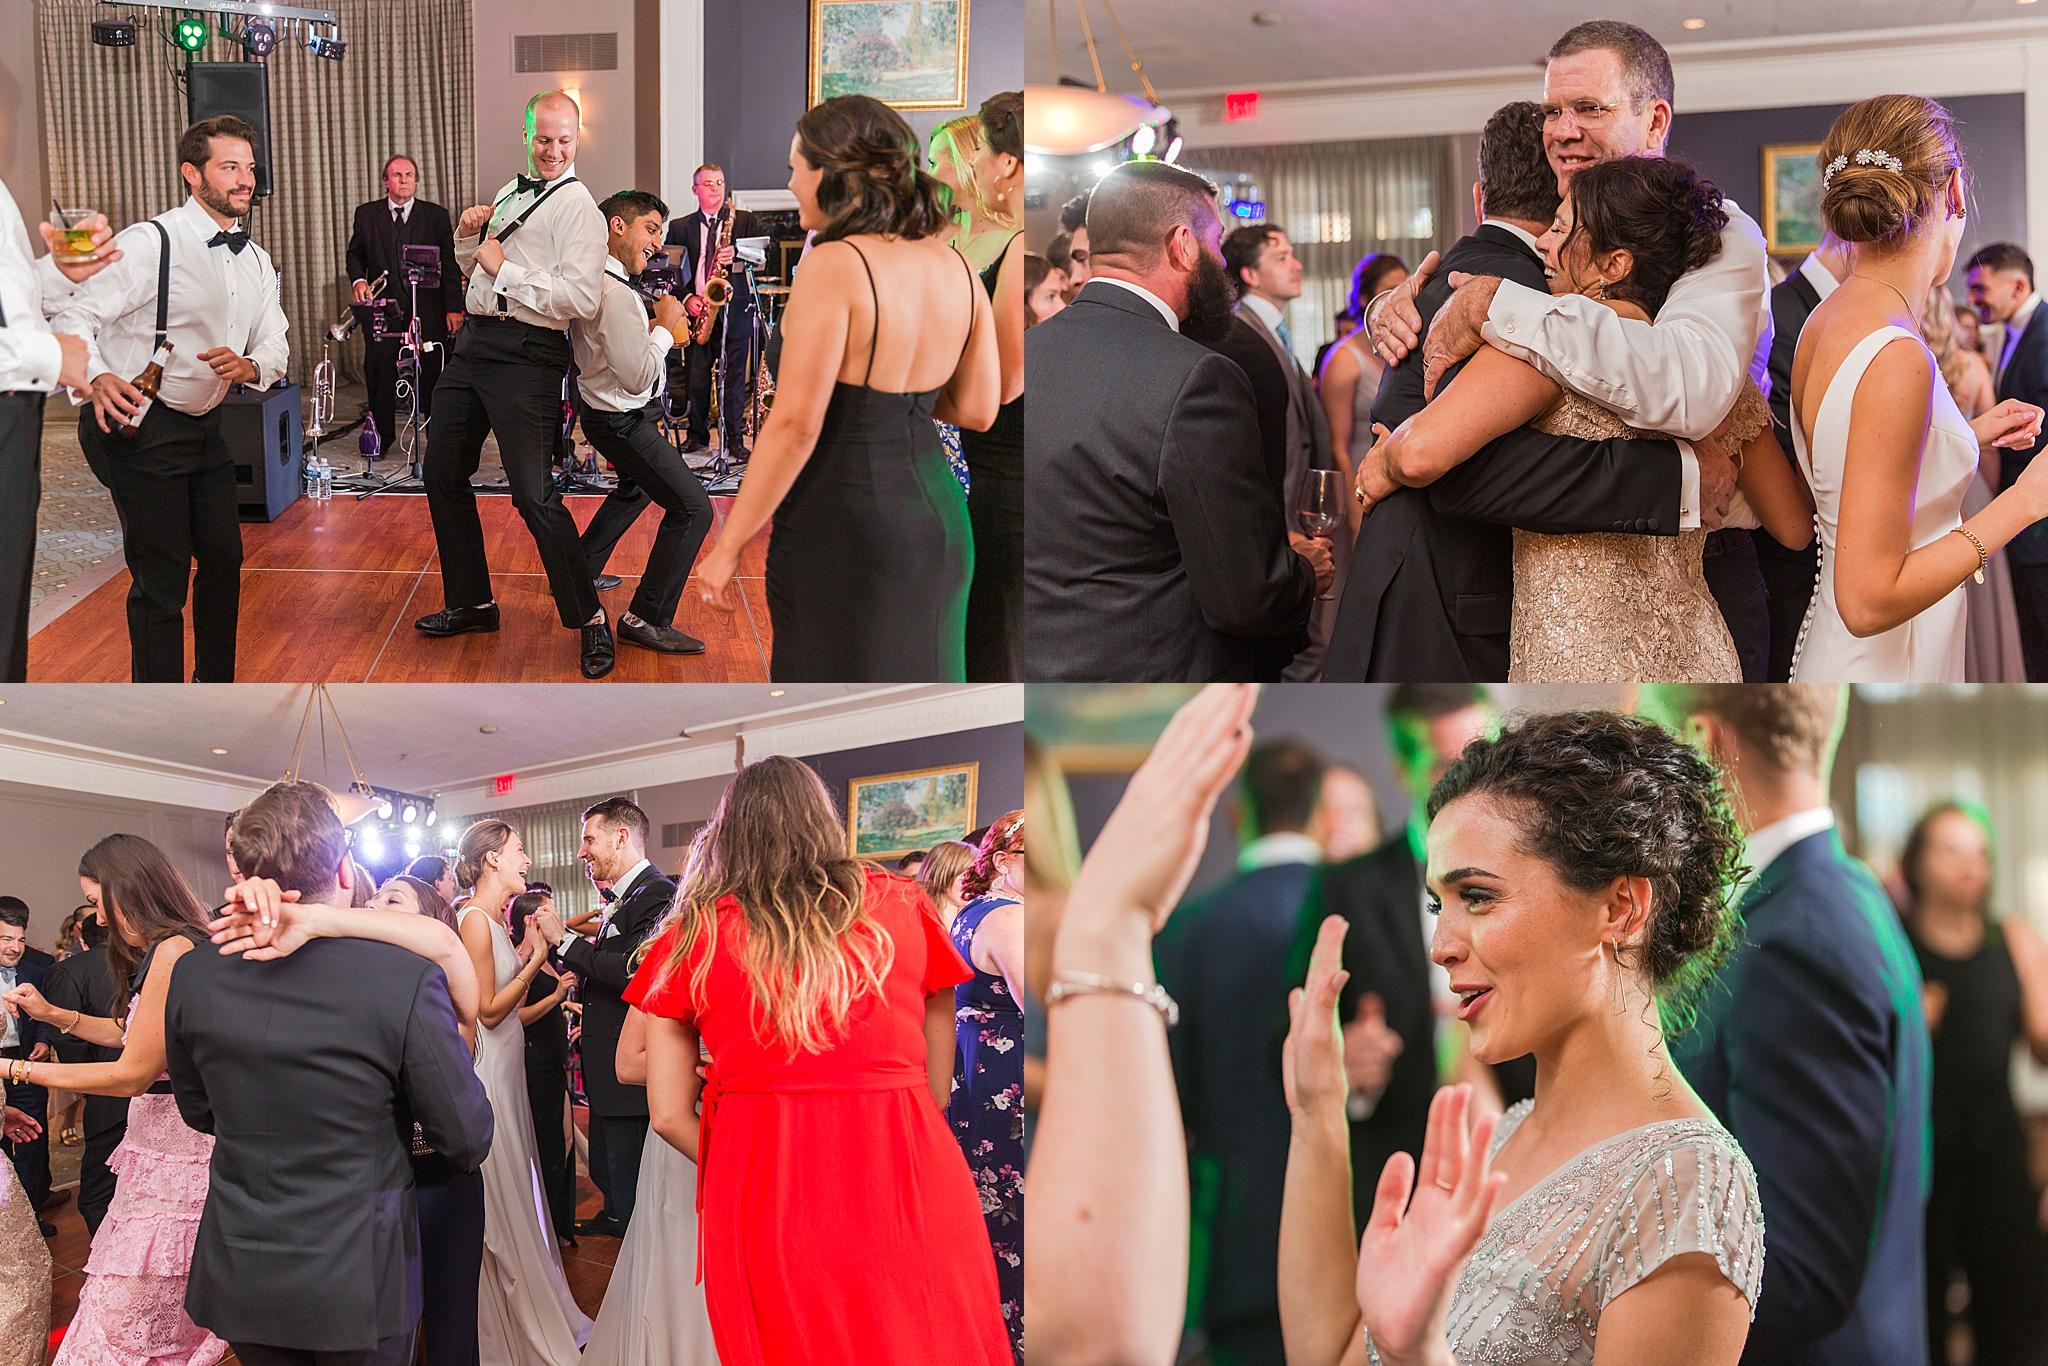 detroit-wedding-photographer-grosse-pointe-academy-chapel-detroit-golf-club-wedding-carly-matt-by-courtney-carolyn-photography_0124.jpg